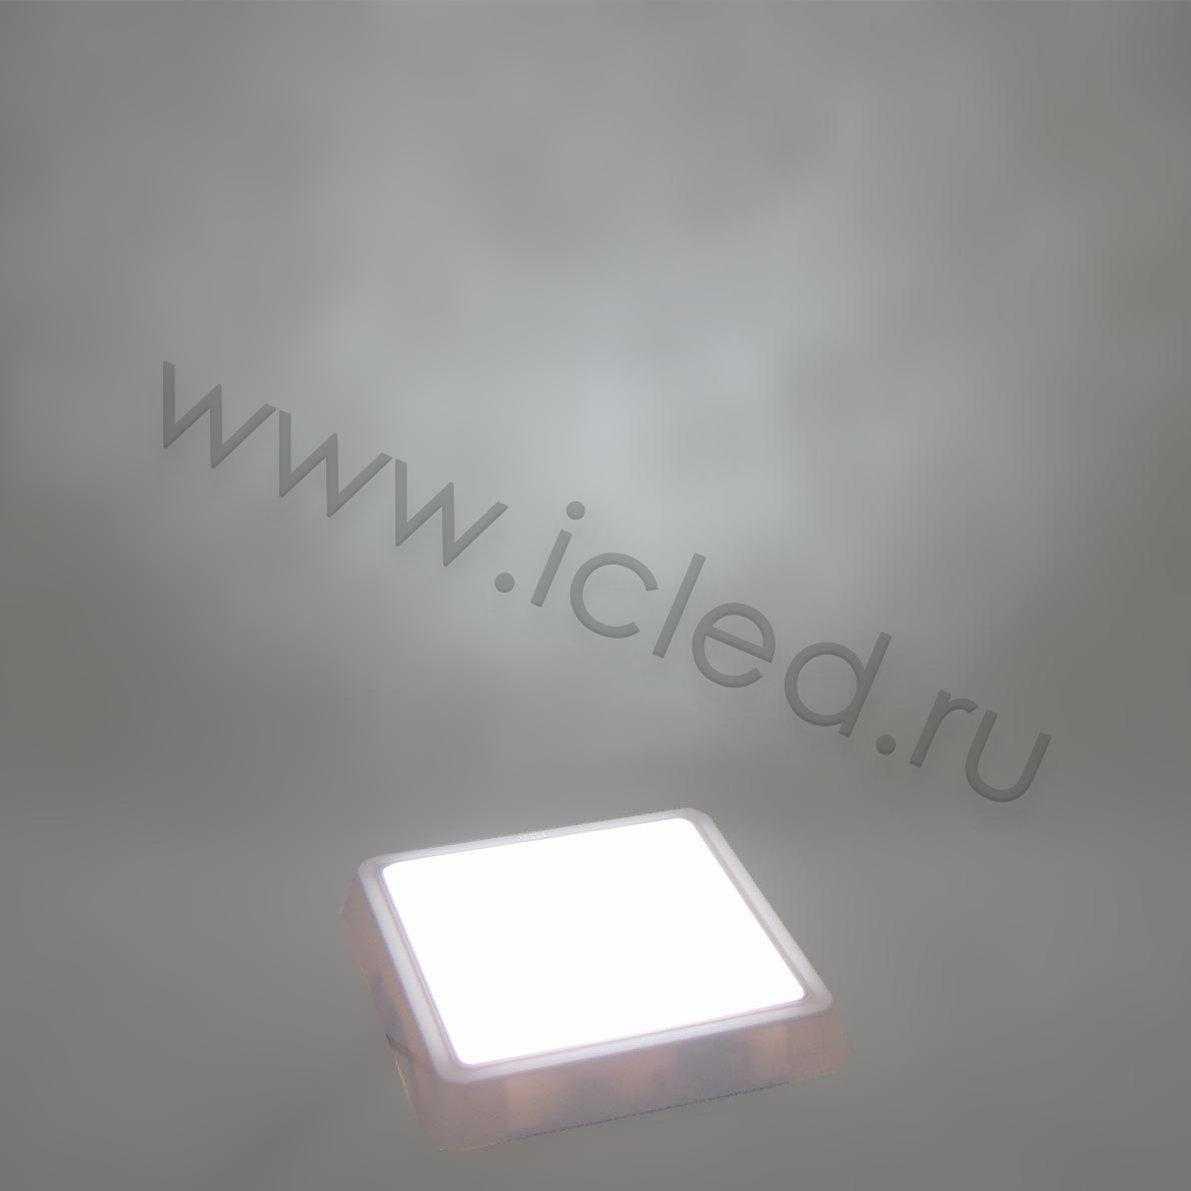 Светодиодный светильник MR-SW L180 (8W, Day White)